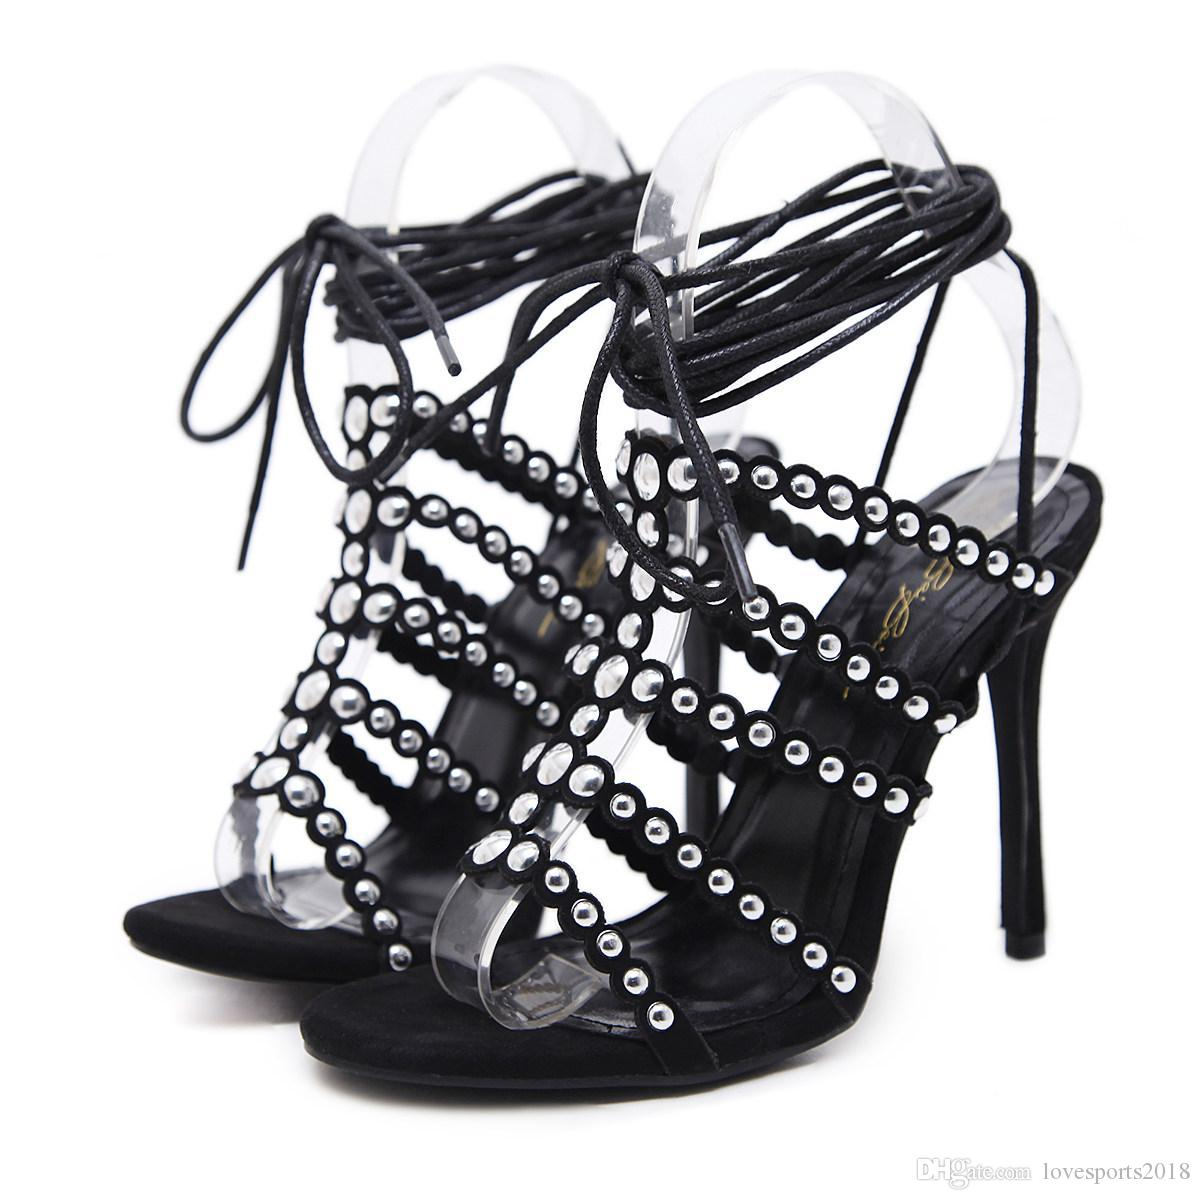 5fad761a417182 New Fashionl Women High Heel Open Toe Rivet Gladiator Catwalk Show ...